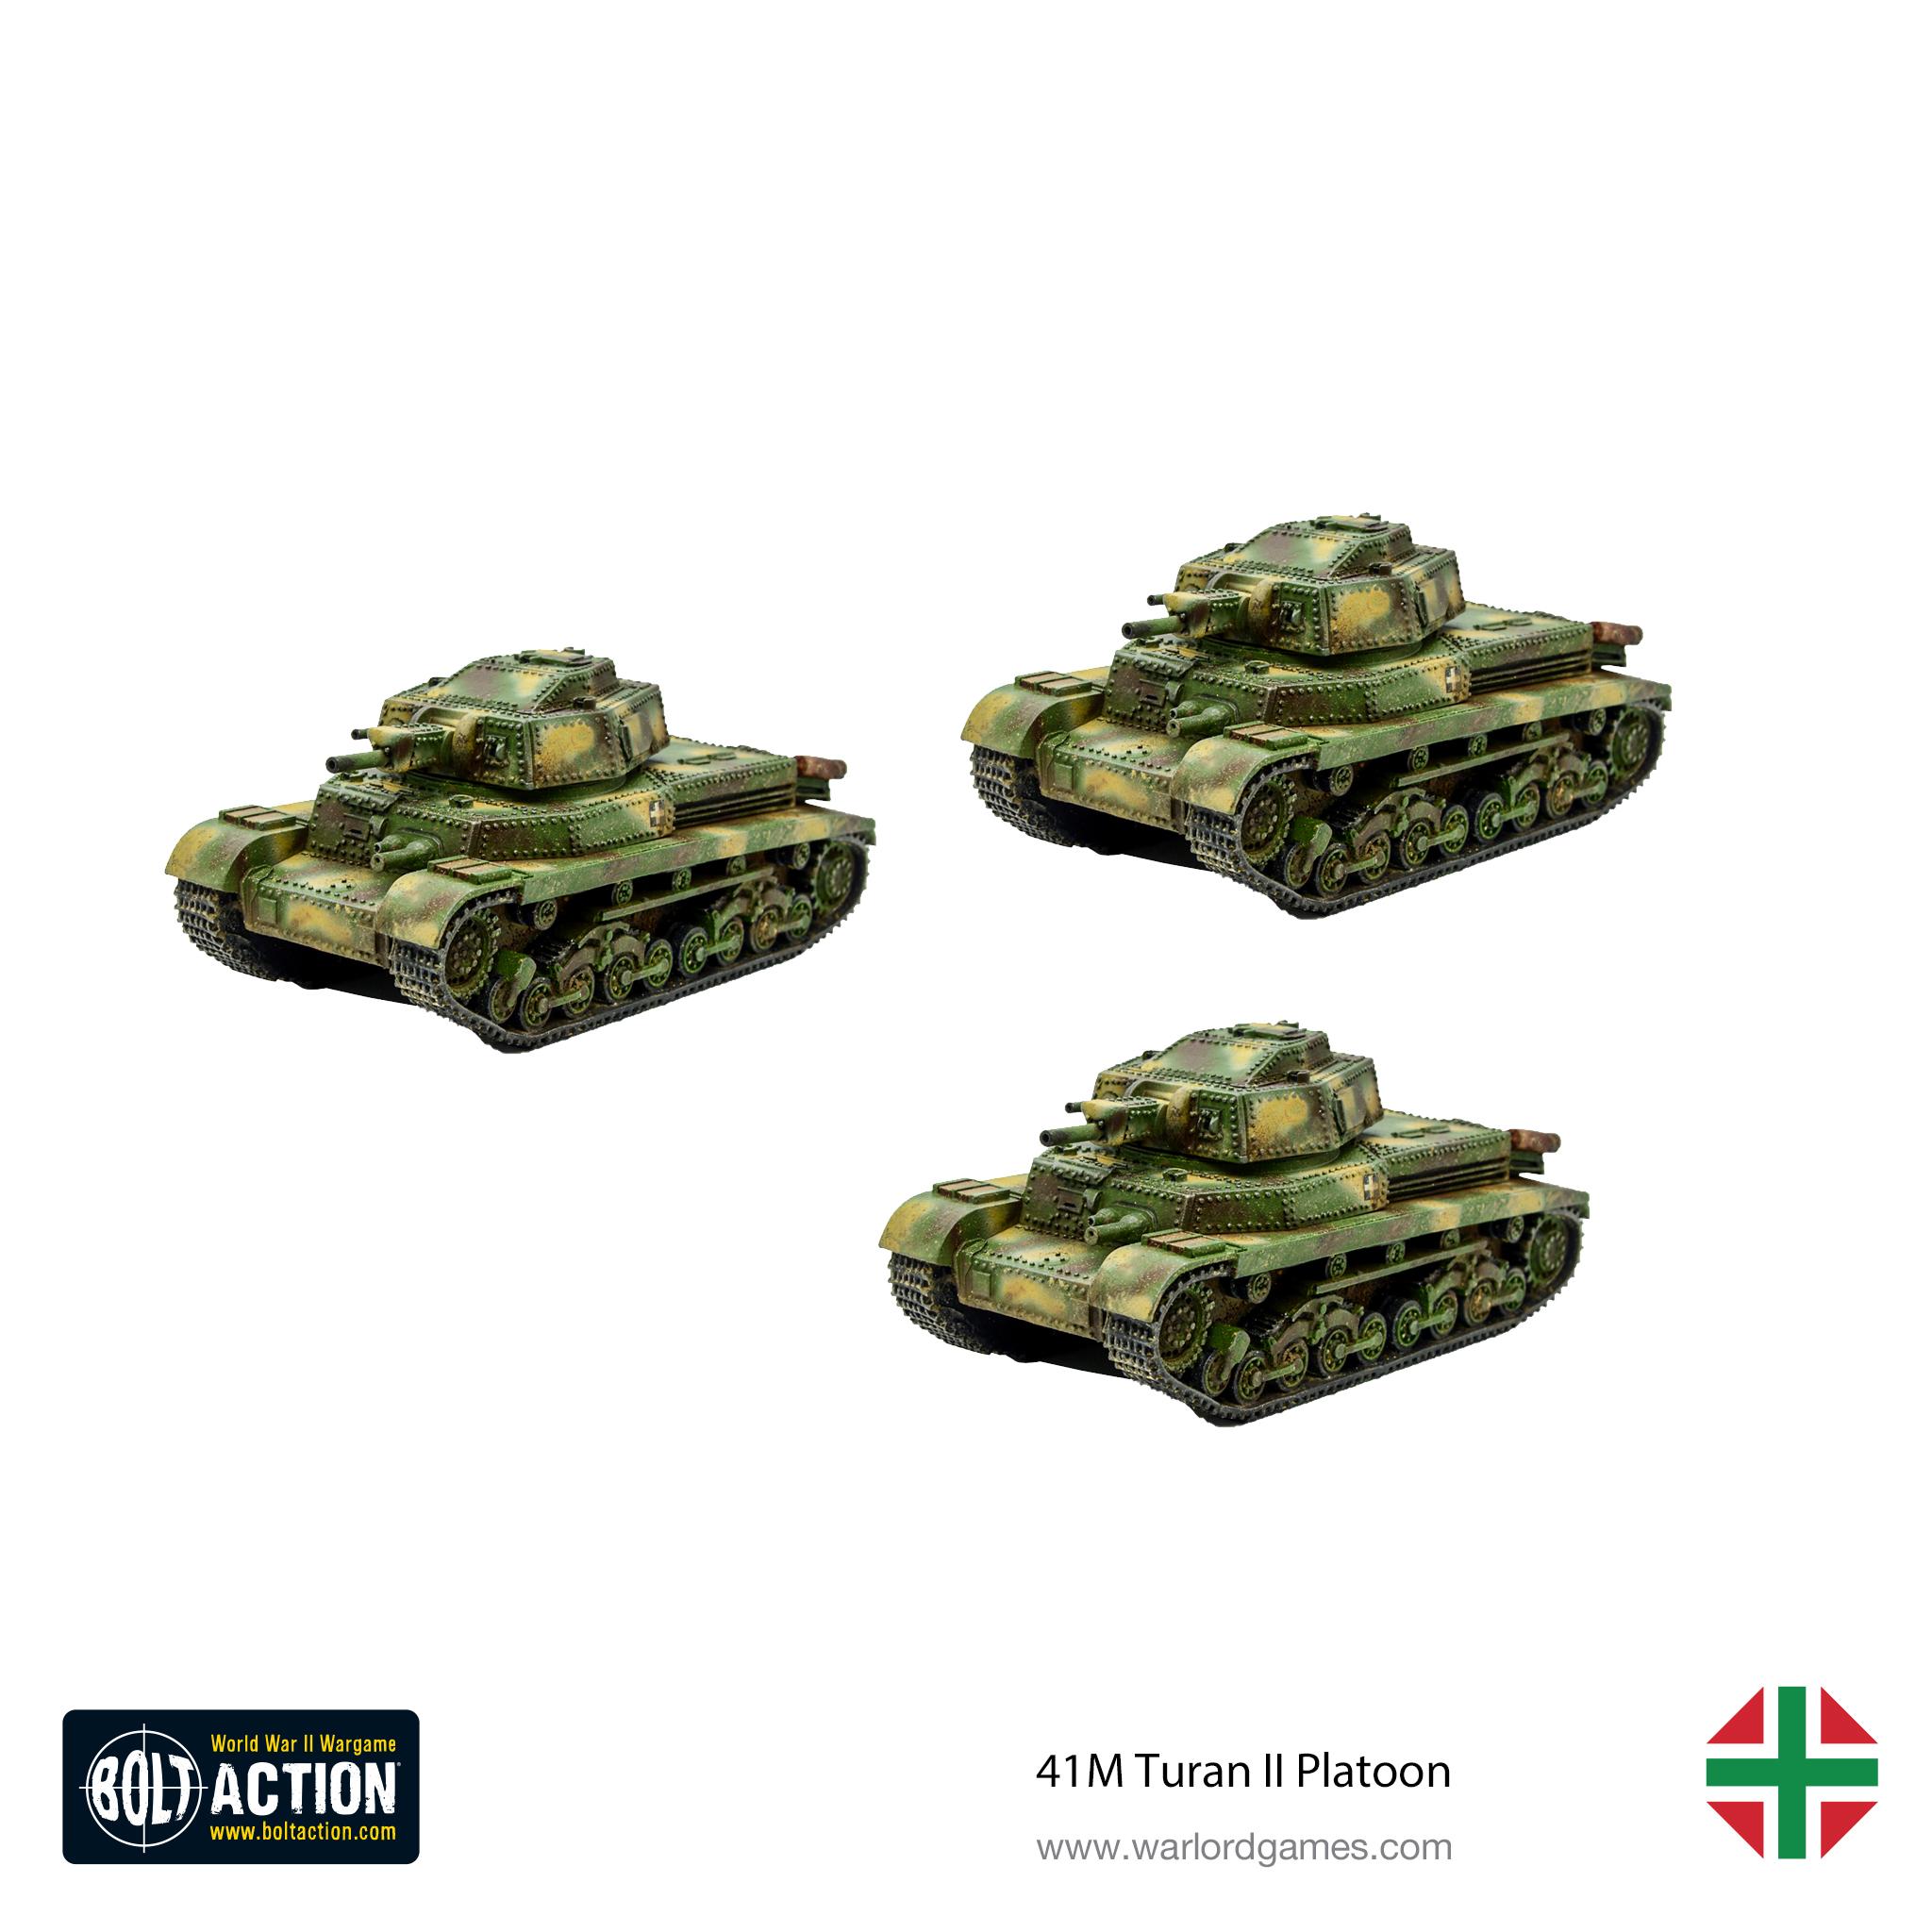 409907401-41M-Turan-II-Platoon.jpg